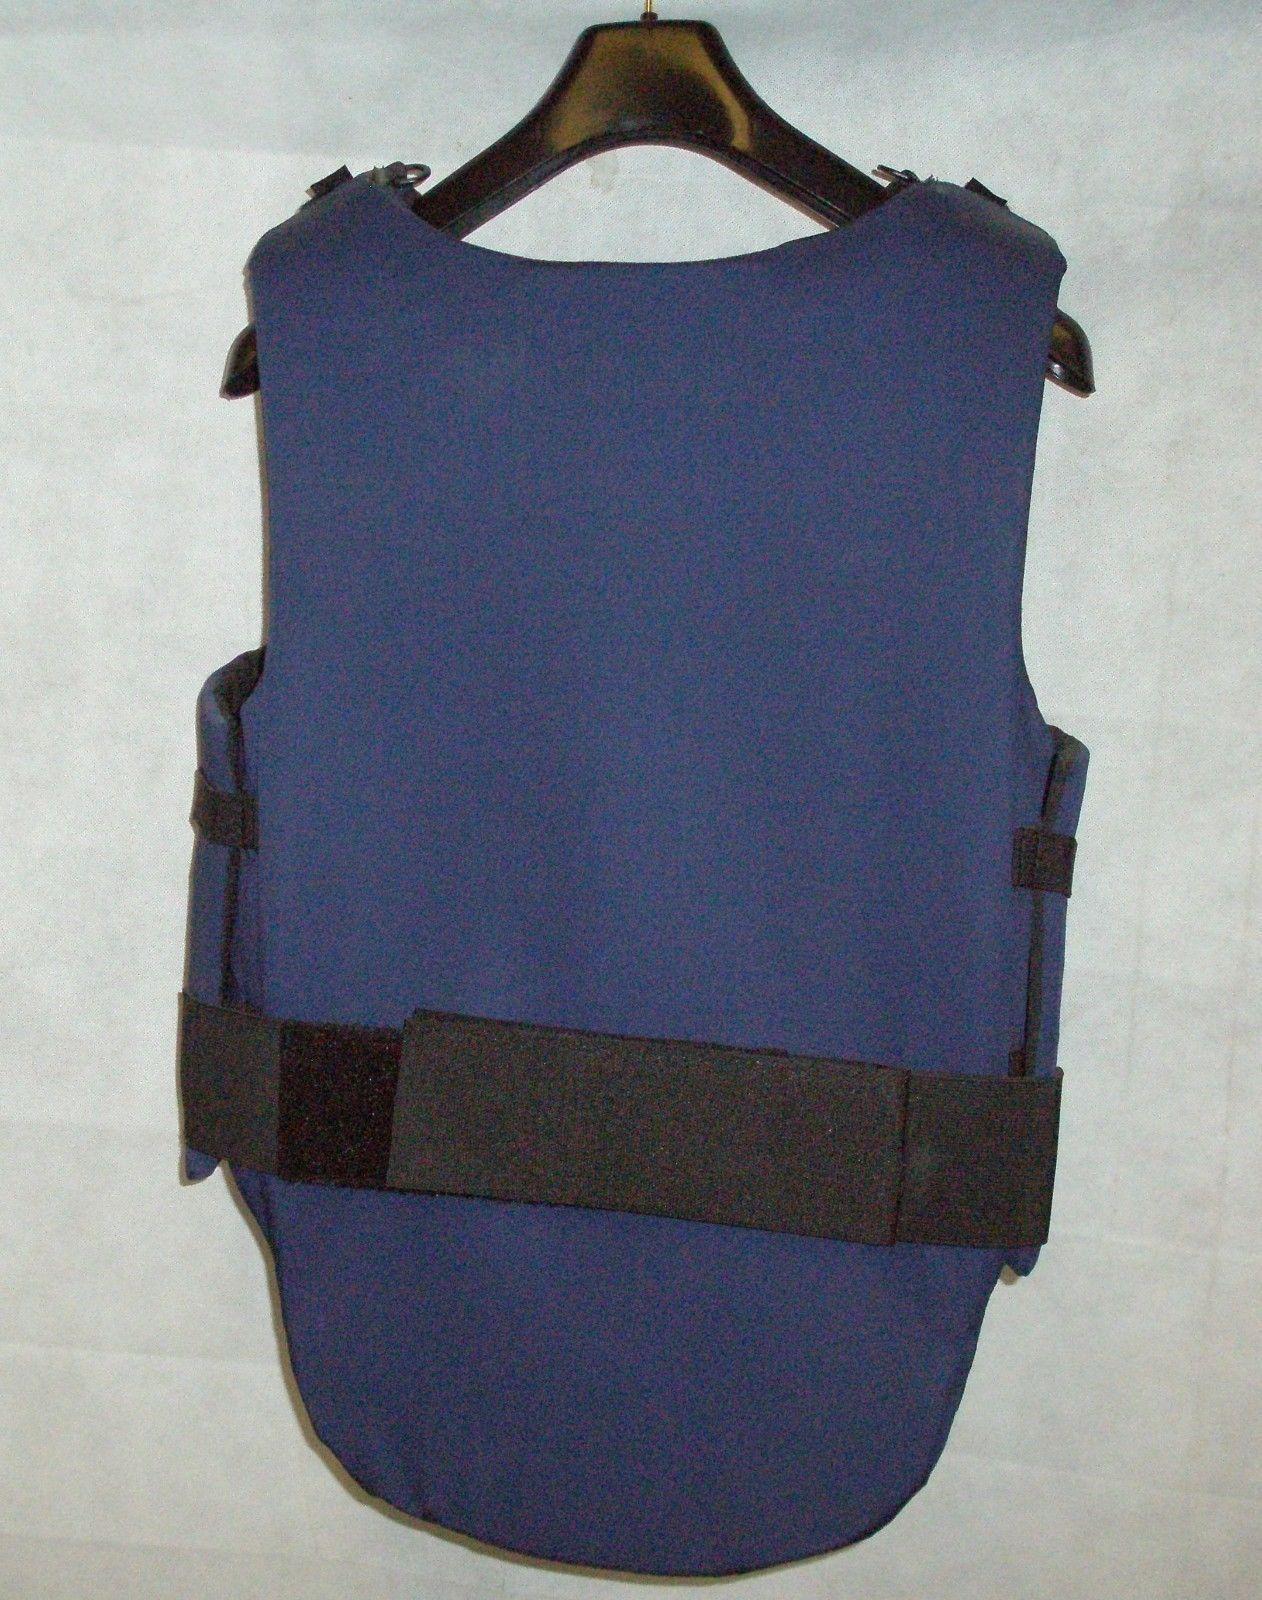 Rodney Powell Powell Rodney Series 5  BETA 2000 level 3 Body protector Childrens & Adults e9f201